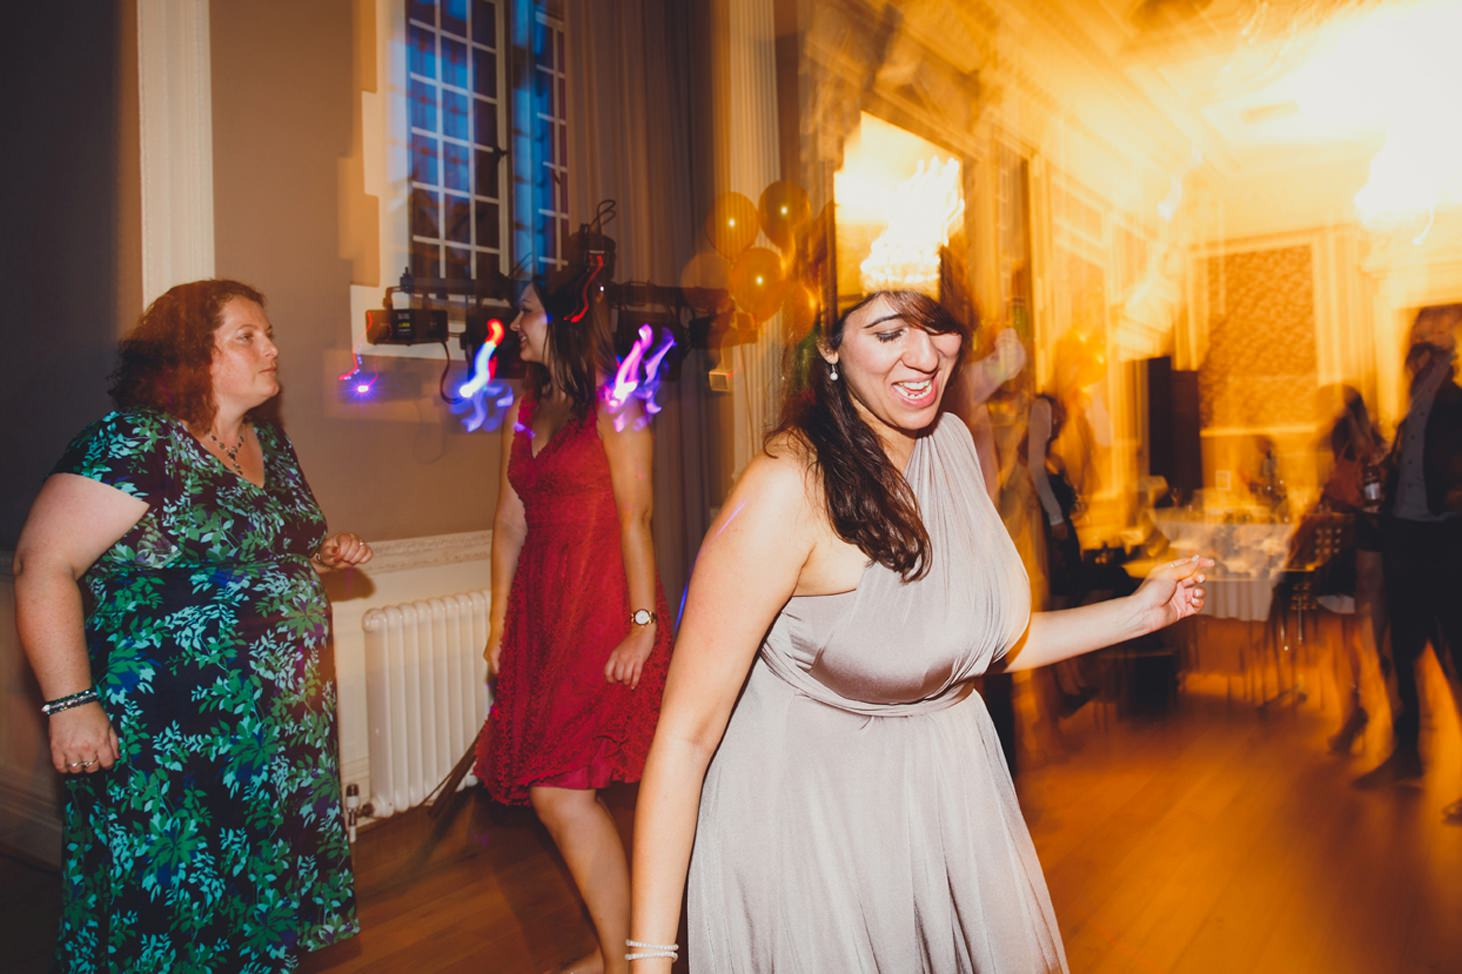 Wycombe Abbey wedding photography bridesmaid dancing